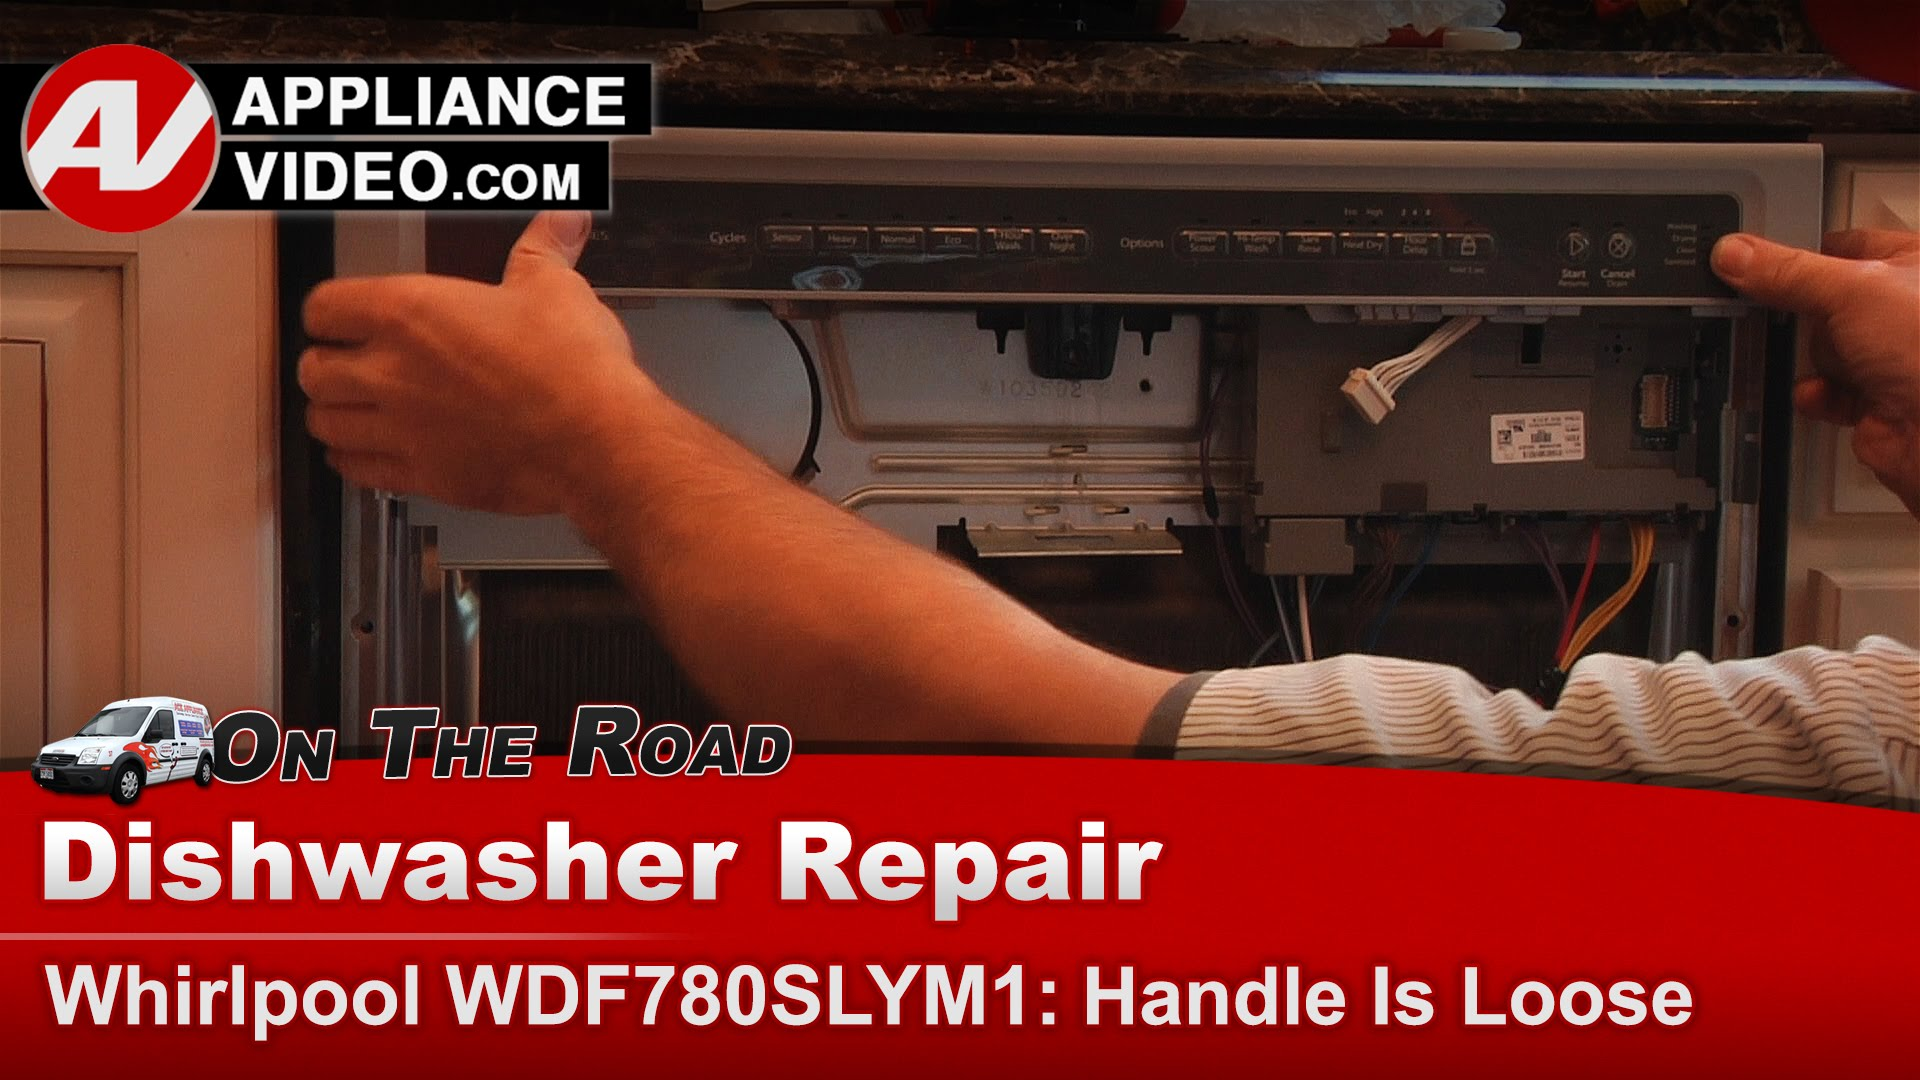 Whirlpool Wdf780slym1 Dishwasher Loose Handle Handle